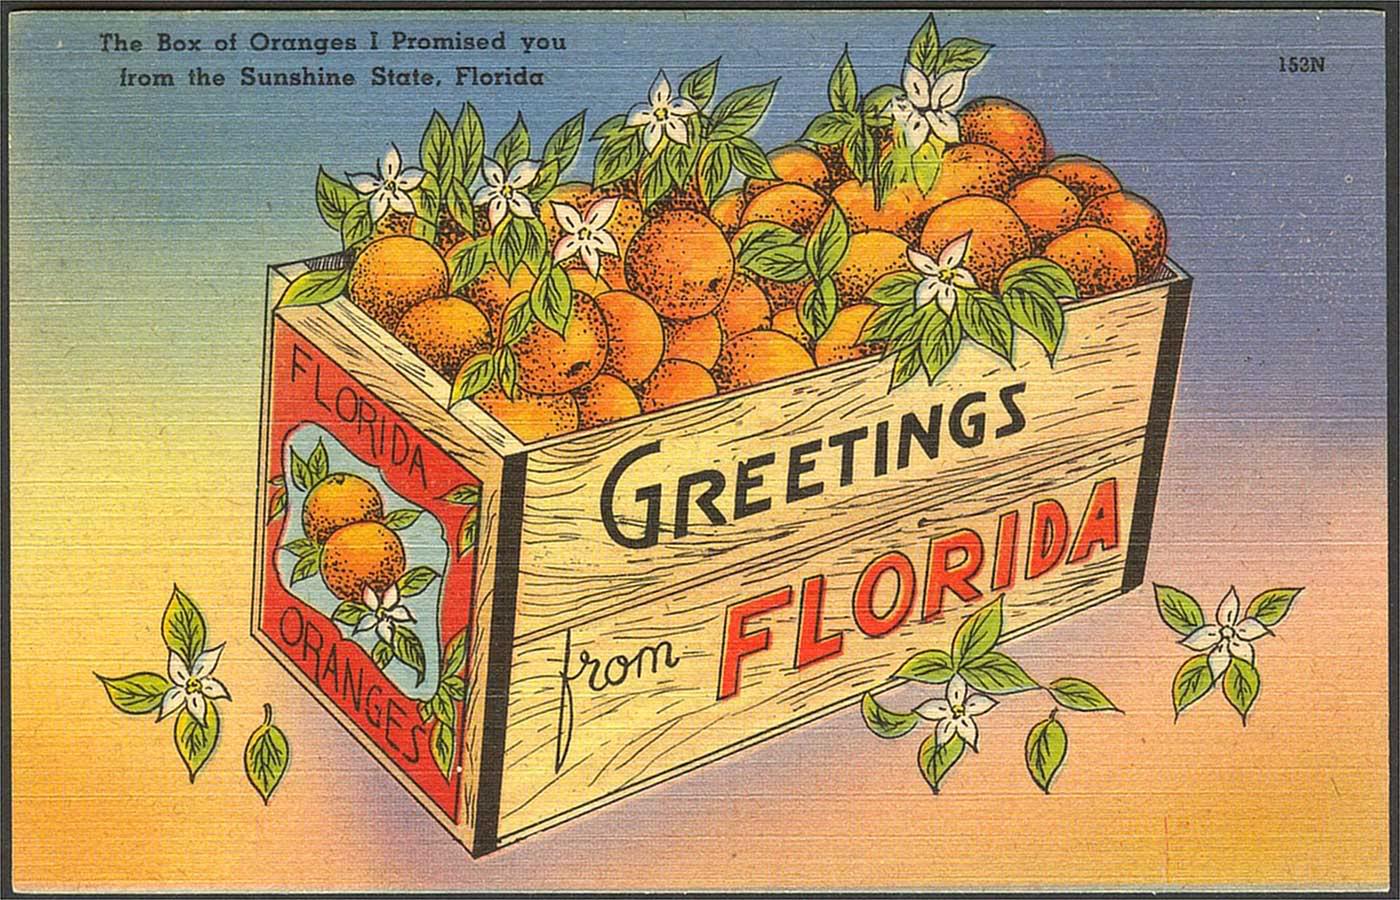 Duchess Fare Florida Bound